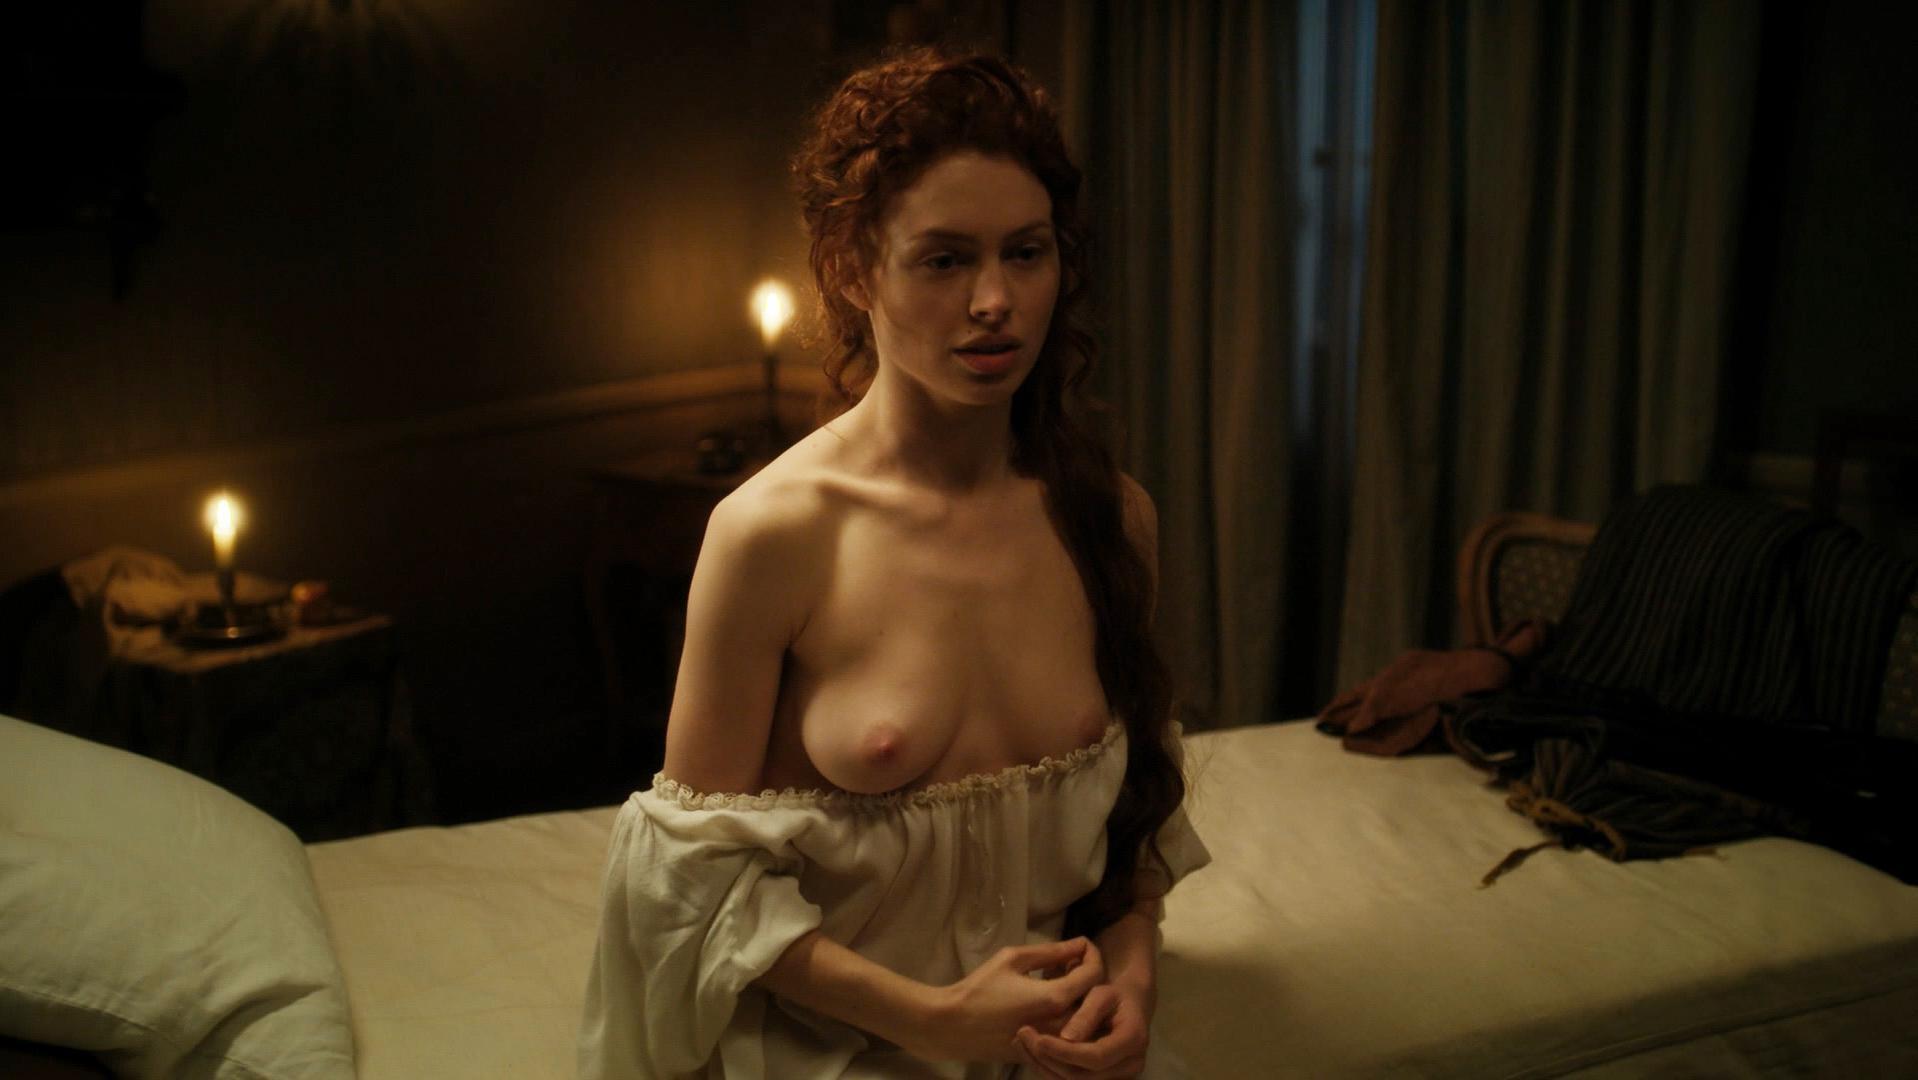 Sarah Winter nude - Casanova s01e01 (2015)